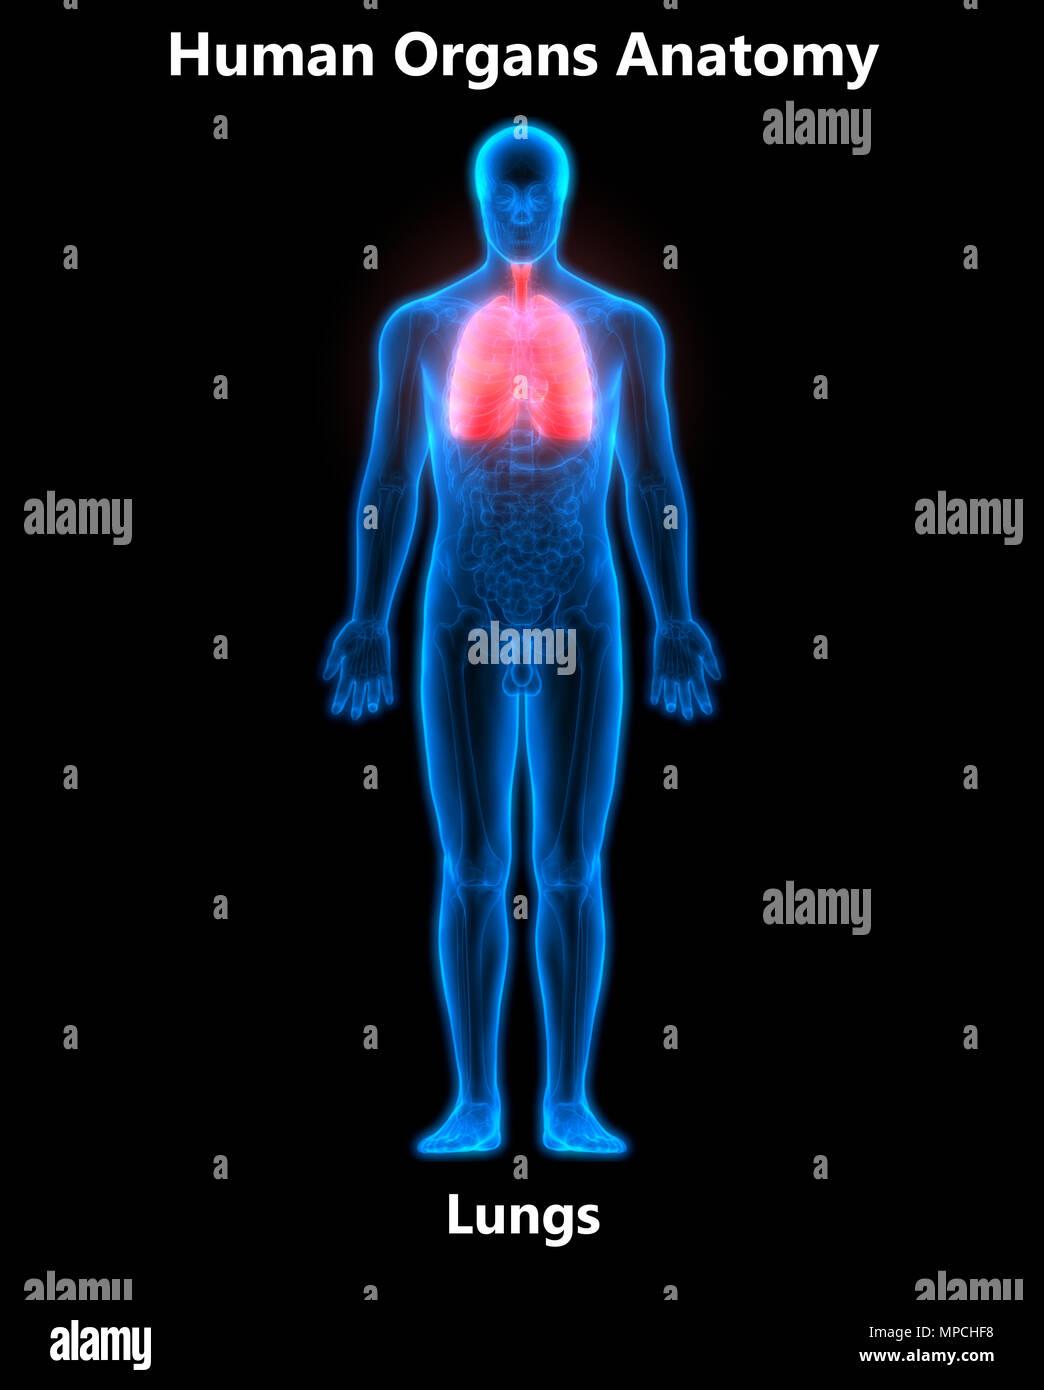 Human Respiratory System Lungs Anatomy Stock Photo: 185903292 - Alamy